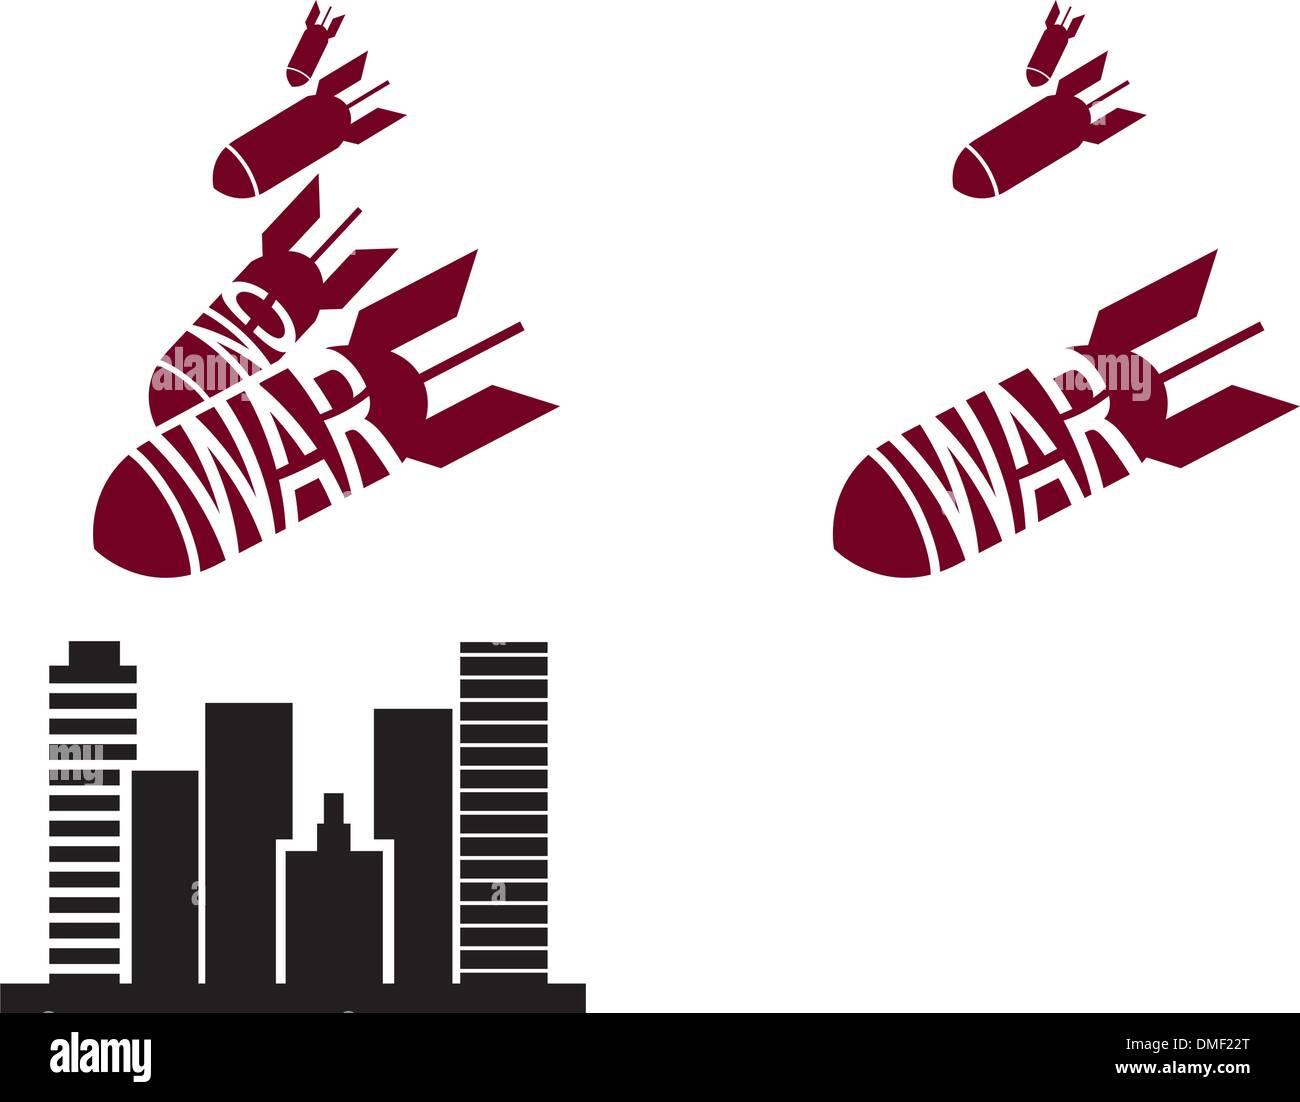 Vector red and black stencil in propaganda style Stock Vector